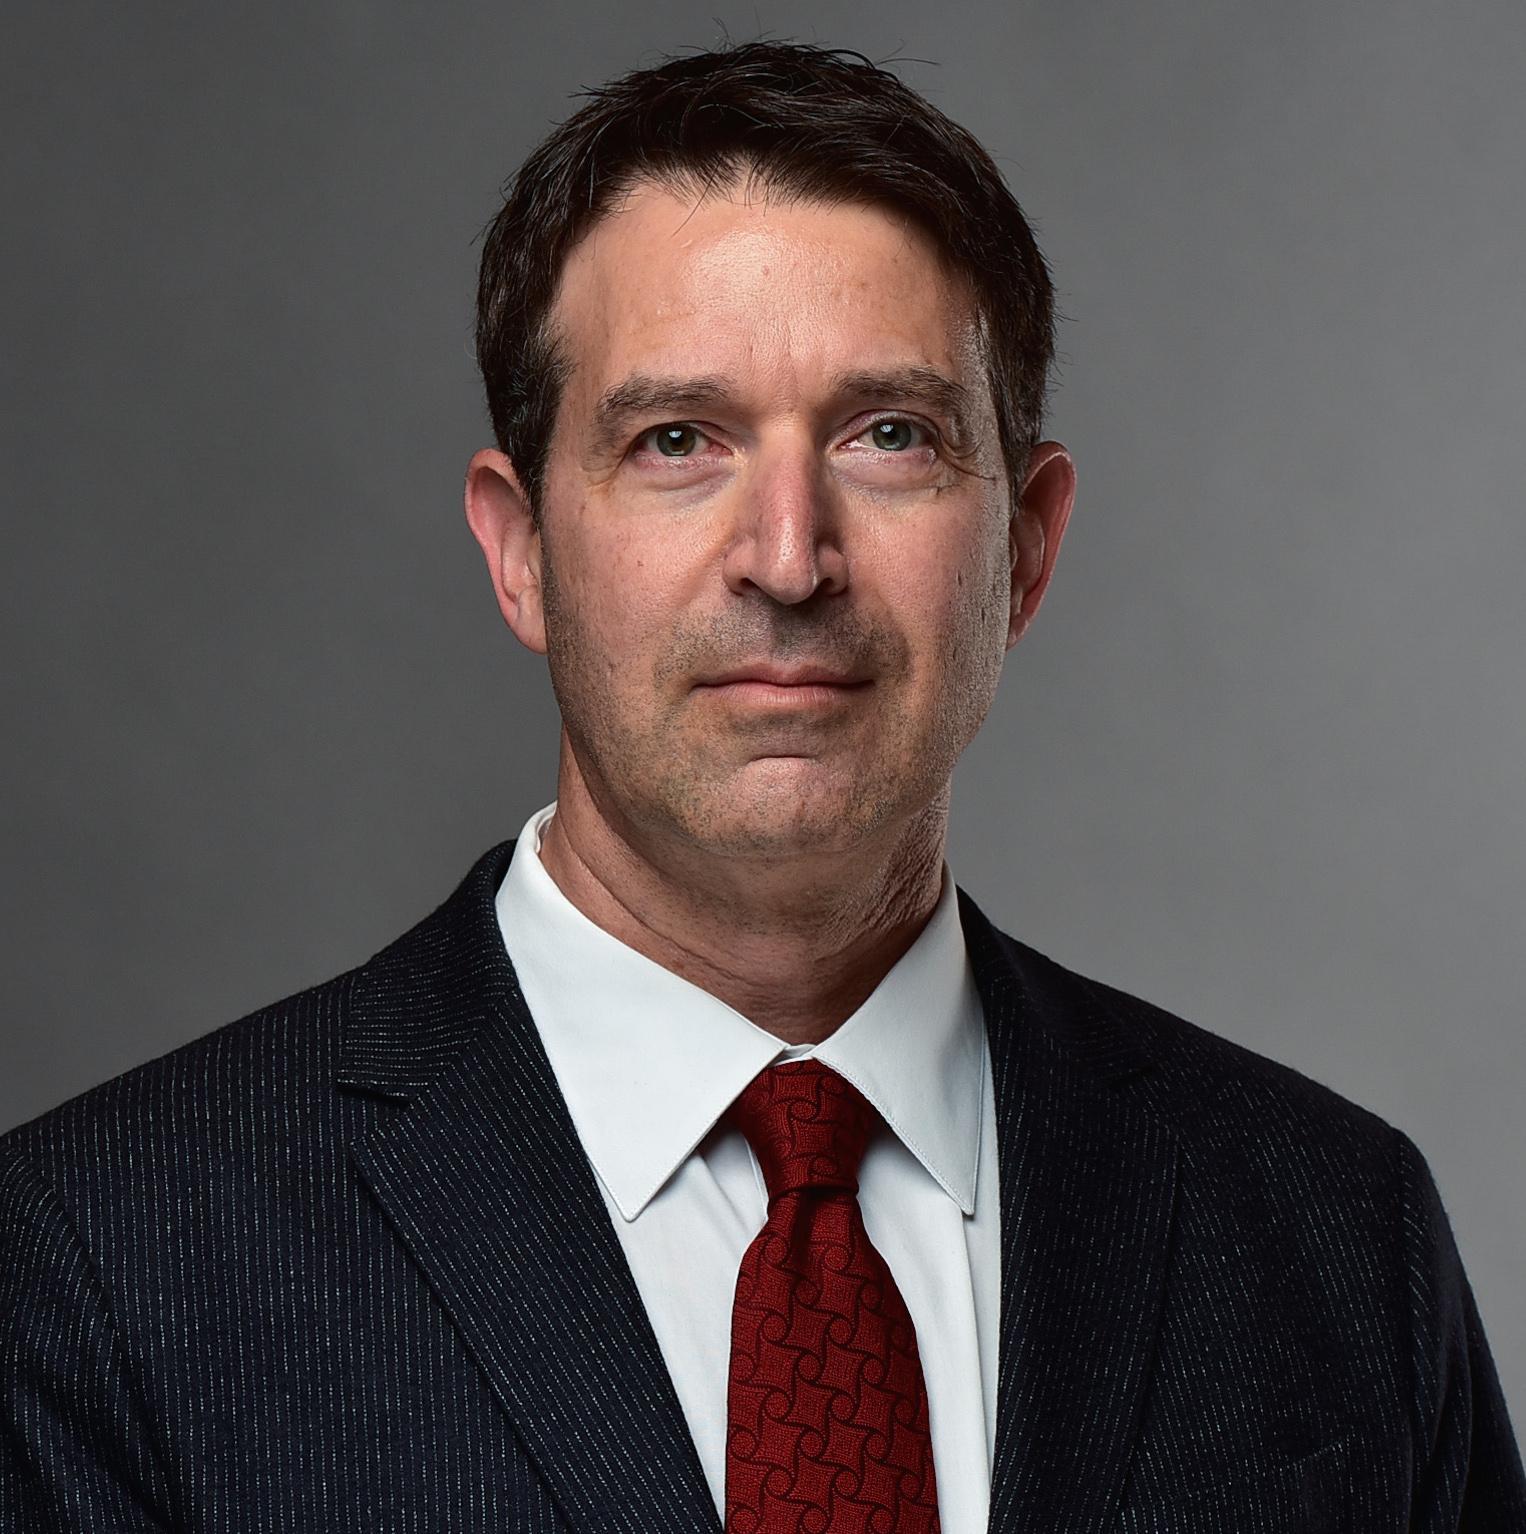 MATTHEW GOCHMAN Financial Professional & Insurance Agent